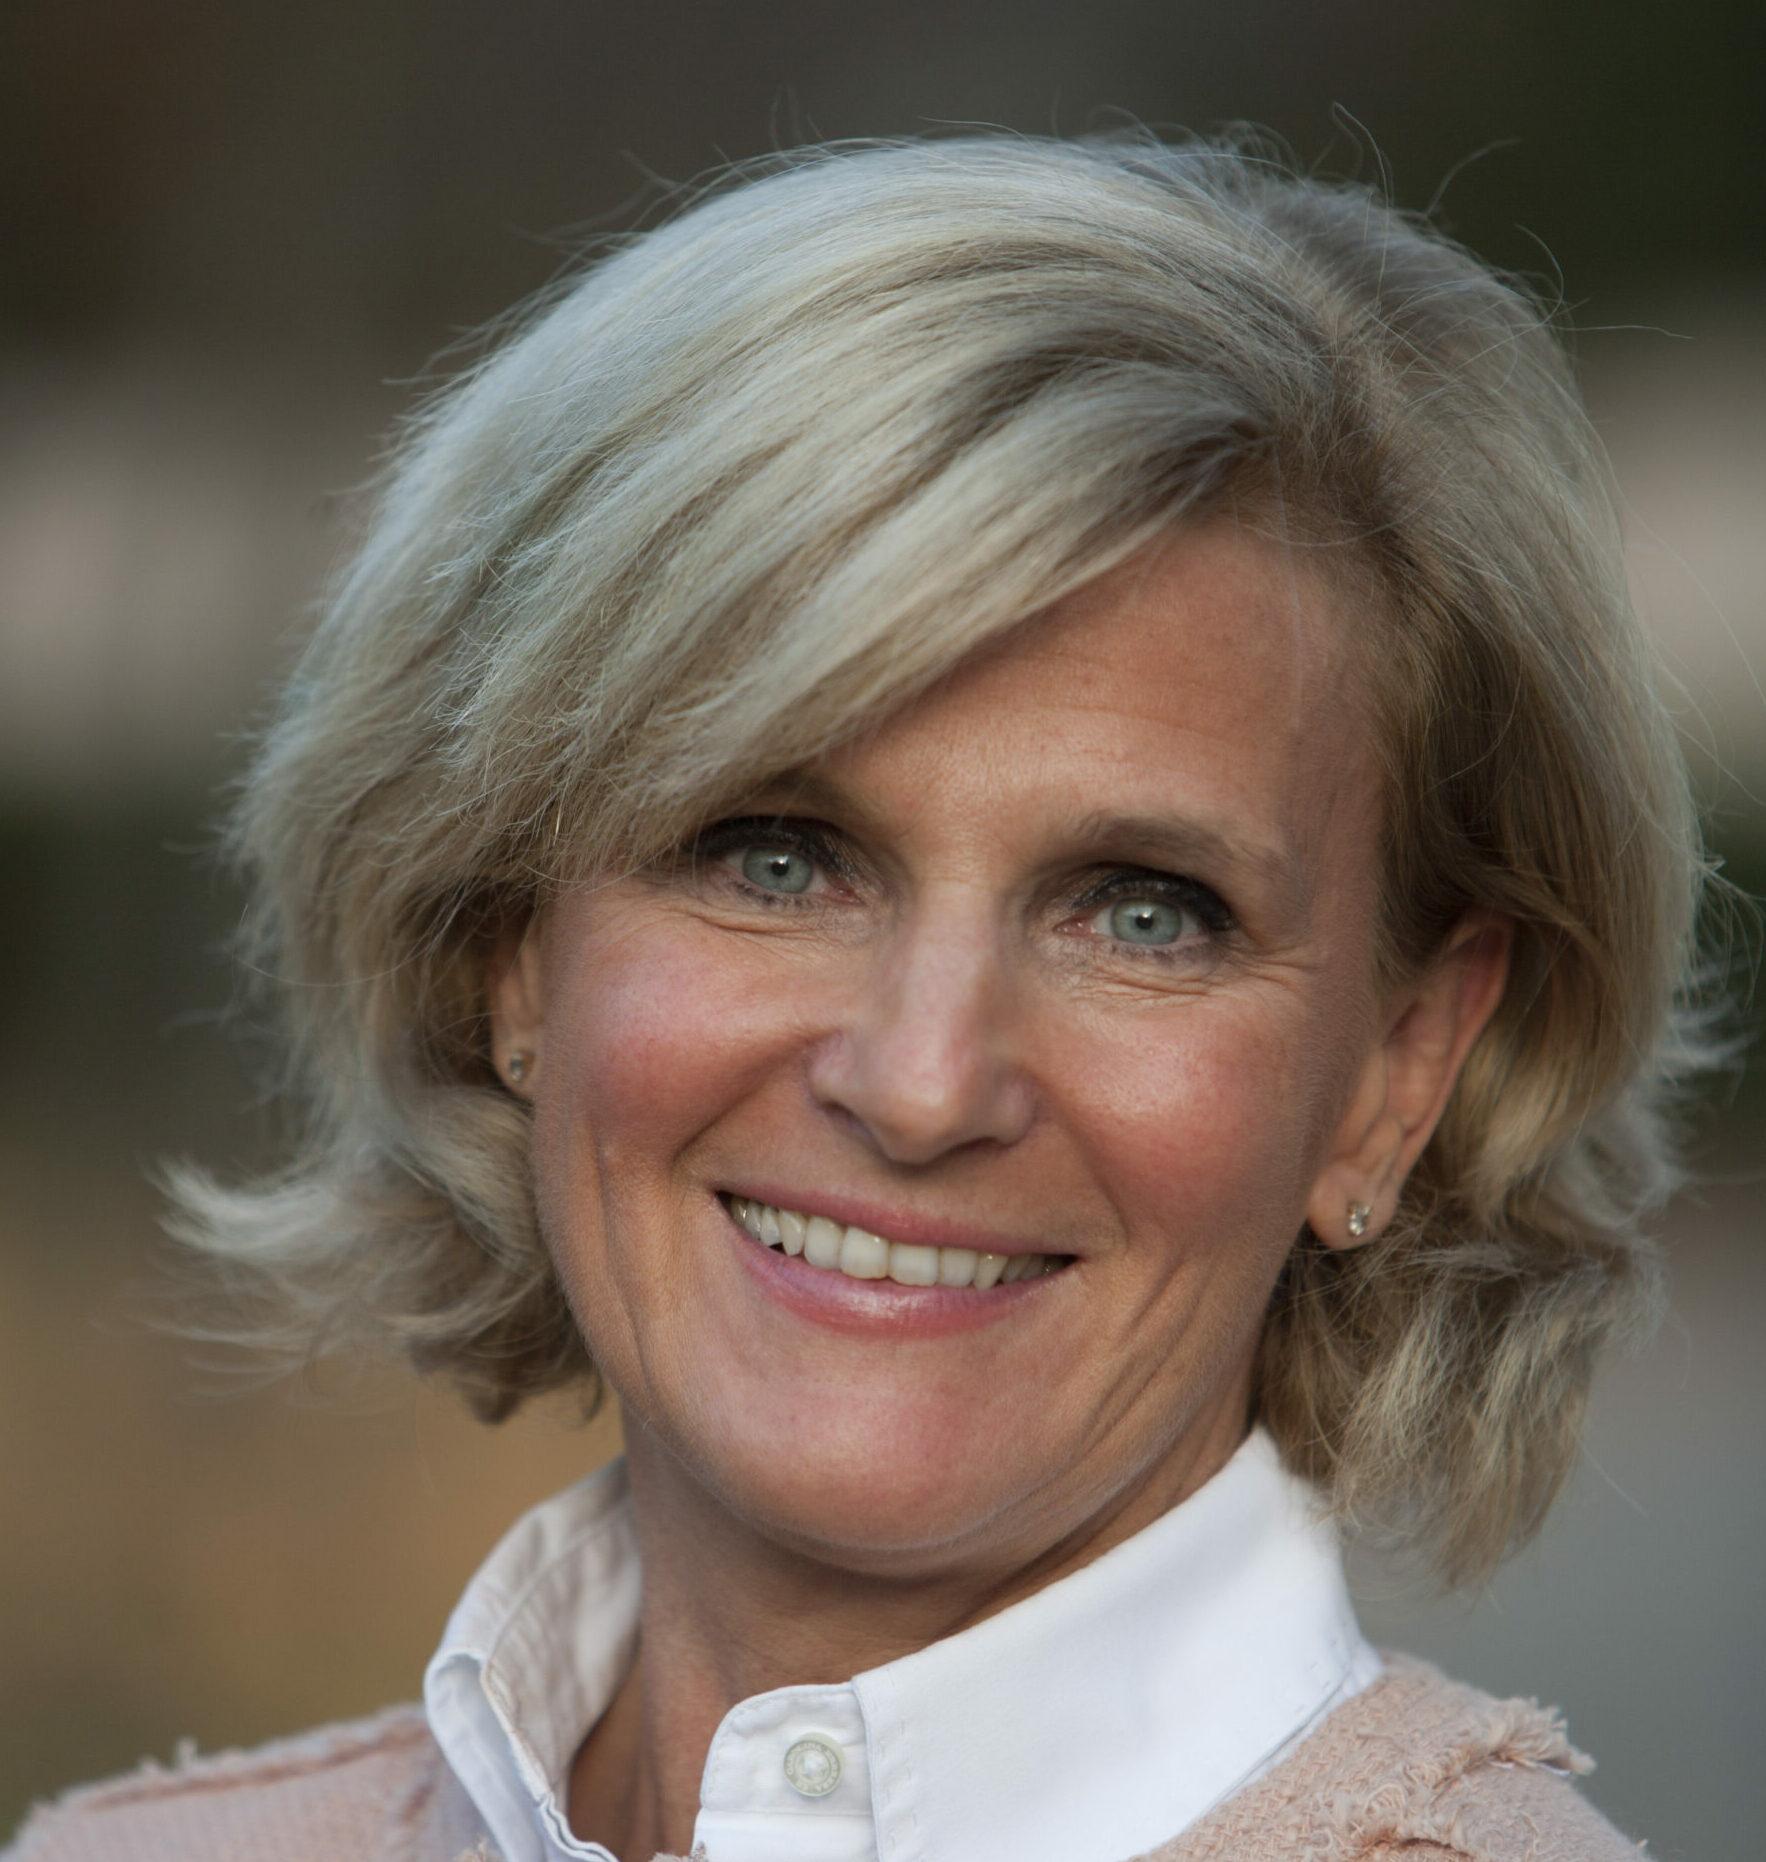 Dr. Maria Neira - profile image